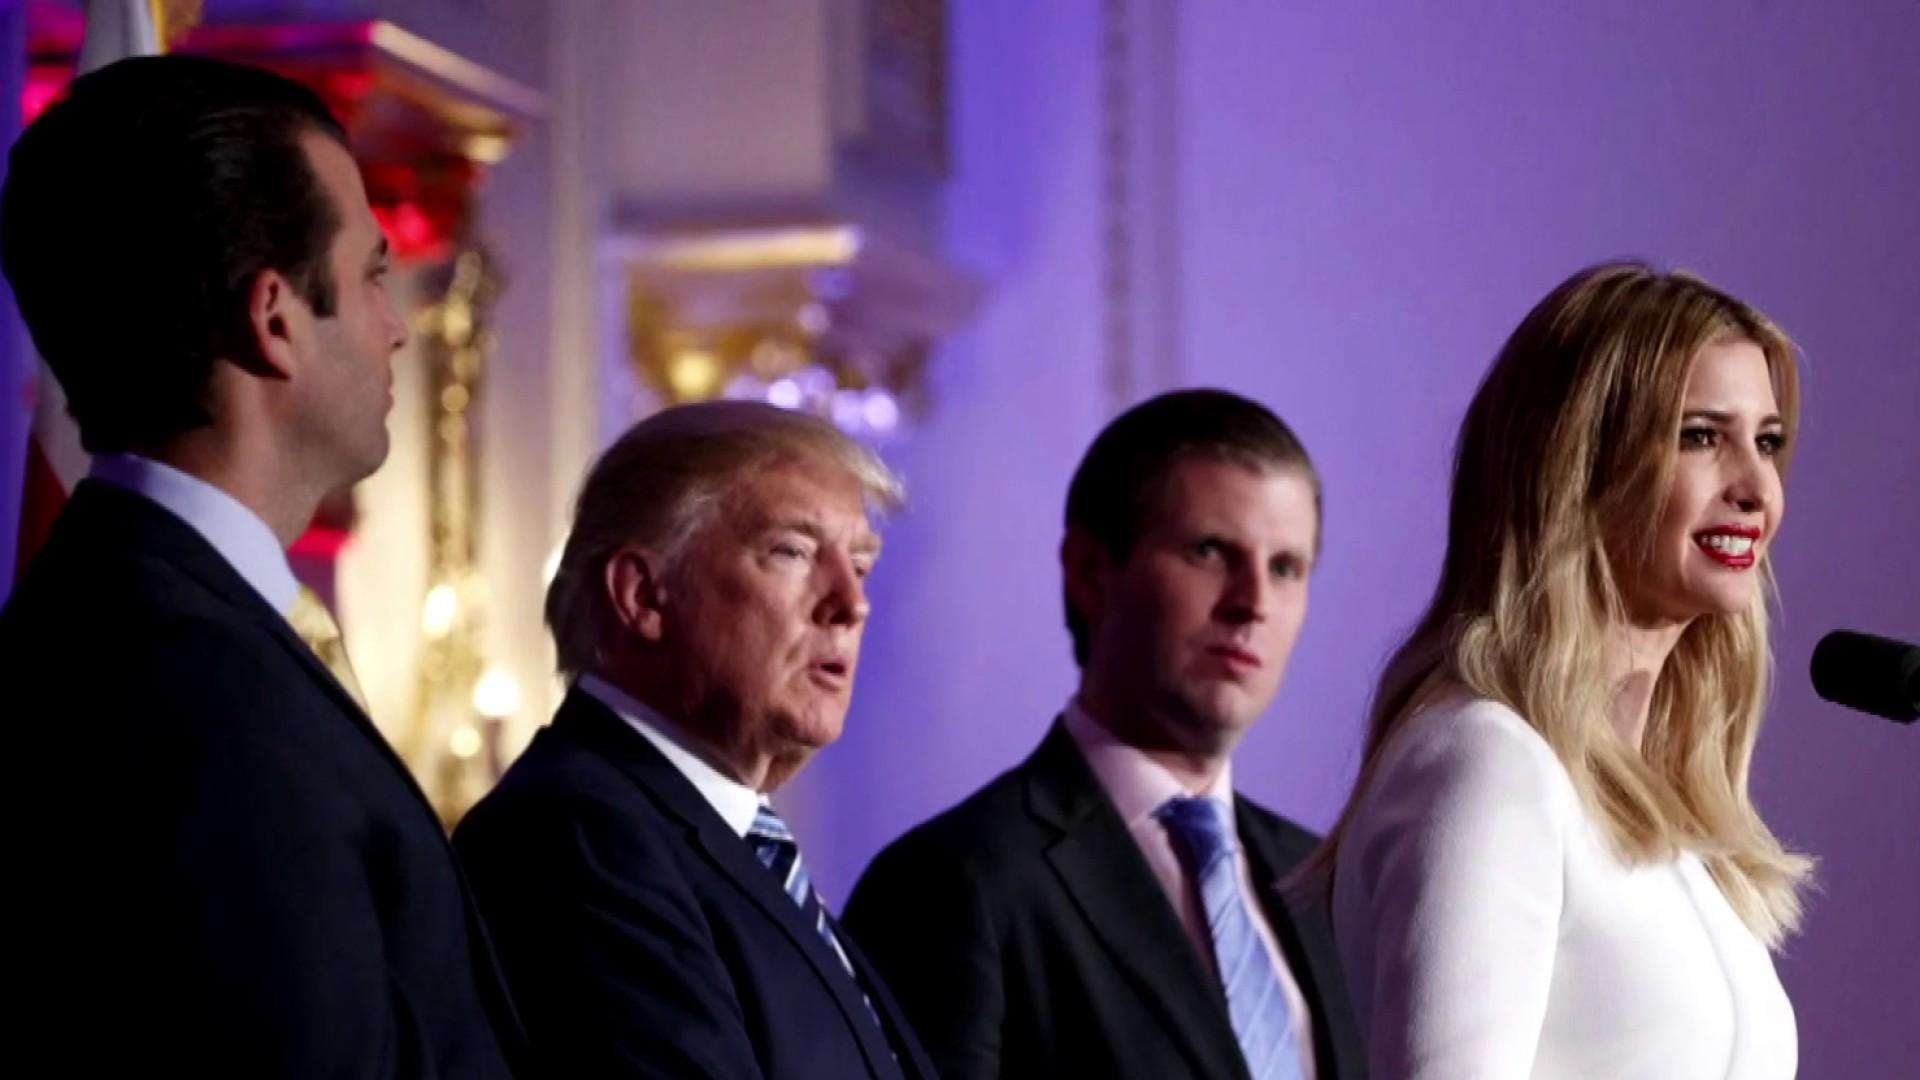 BREAKING: Trump Org senior vice president subpoenaed by grand jury thumbnail